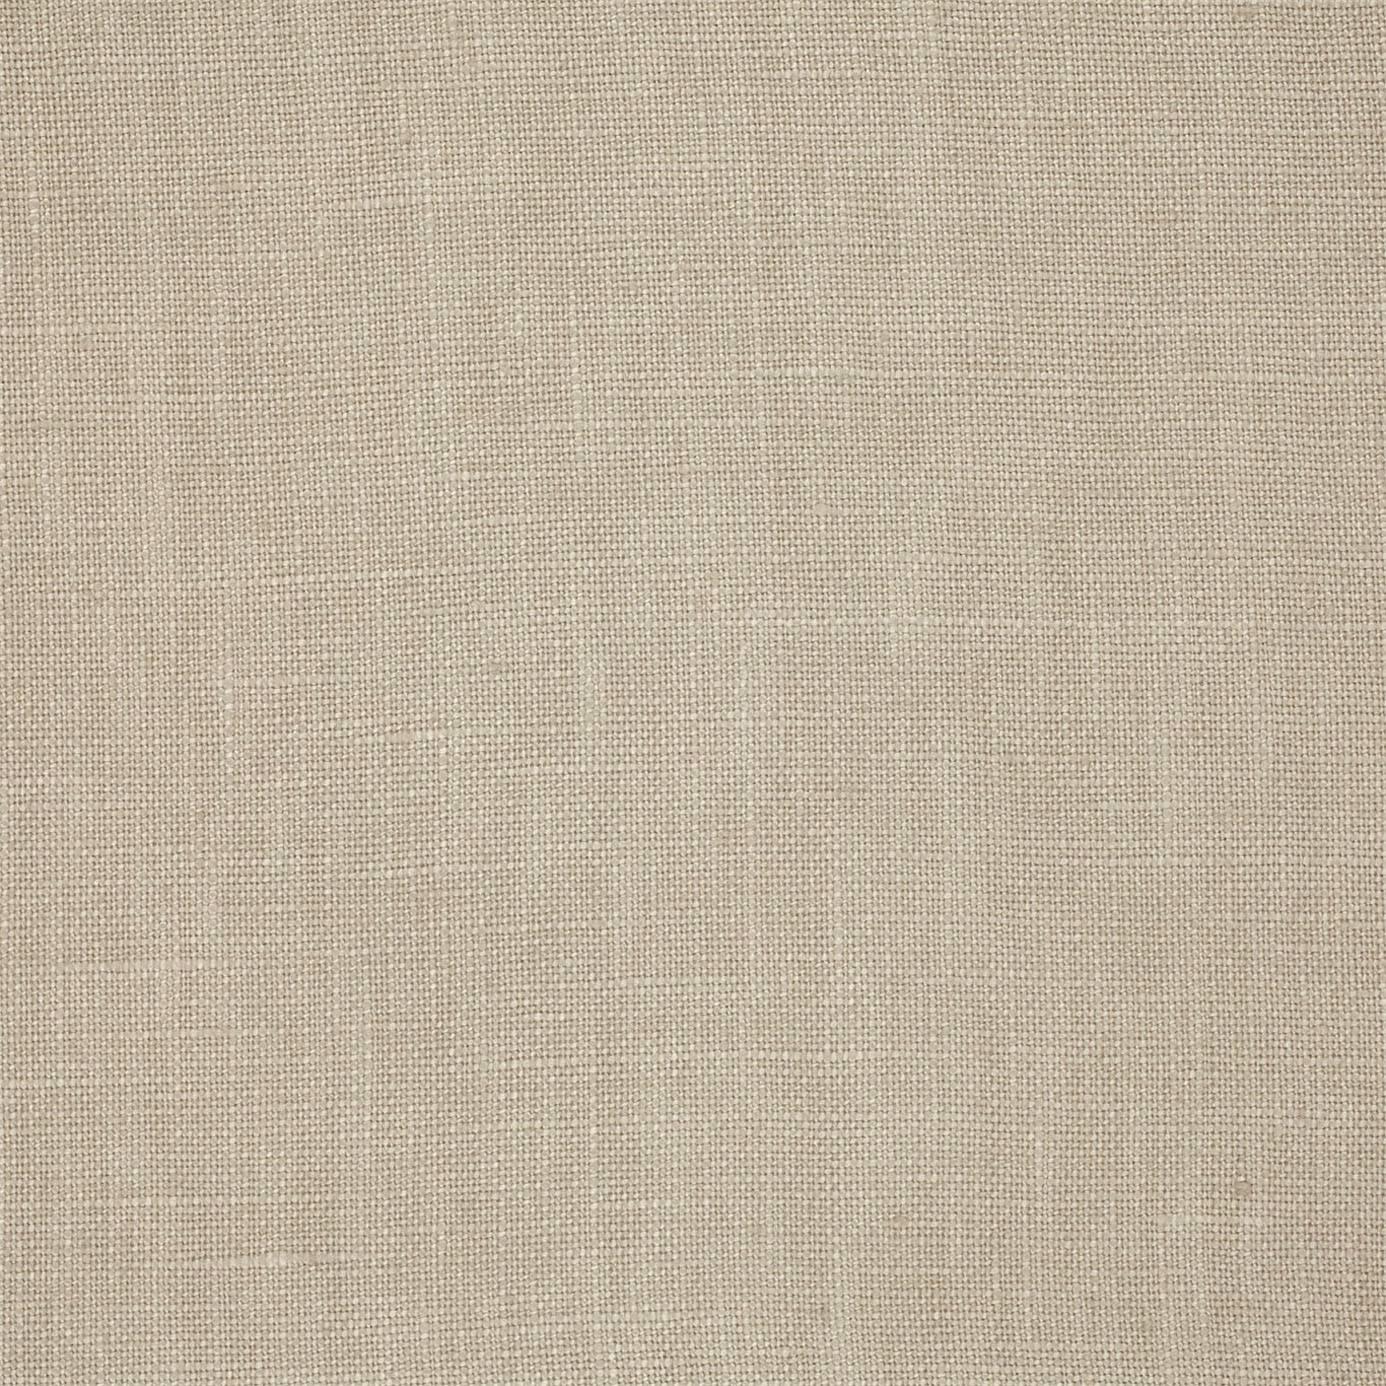 Boheme Linen Fabric Linen 131007 Harlequin Boheme